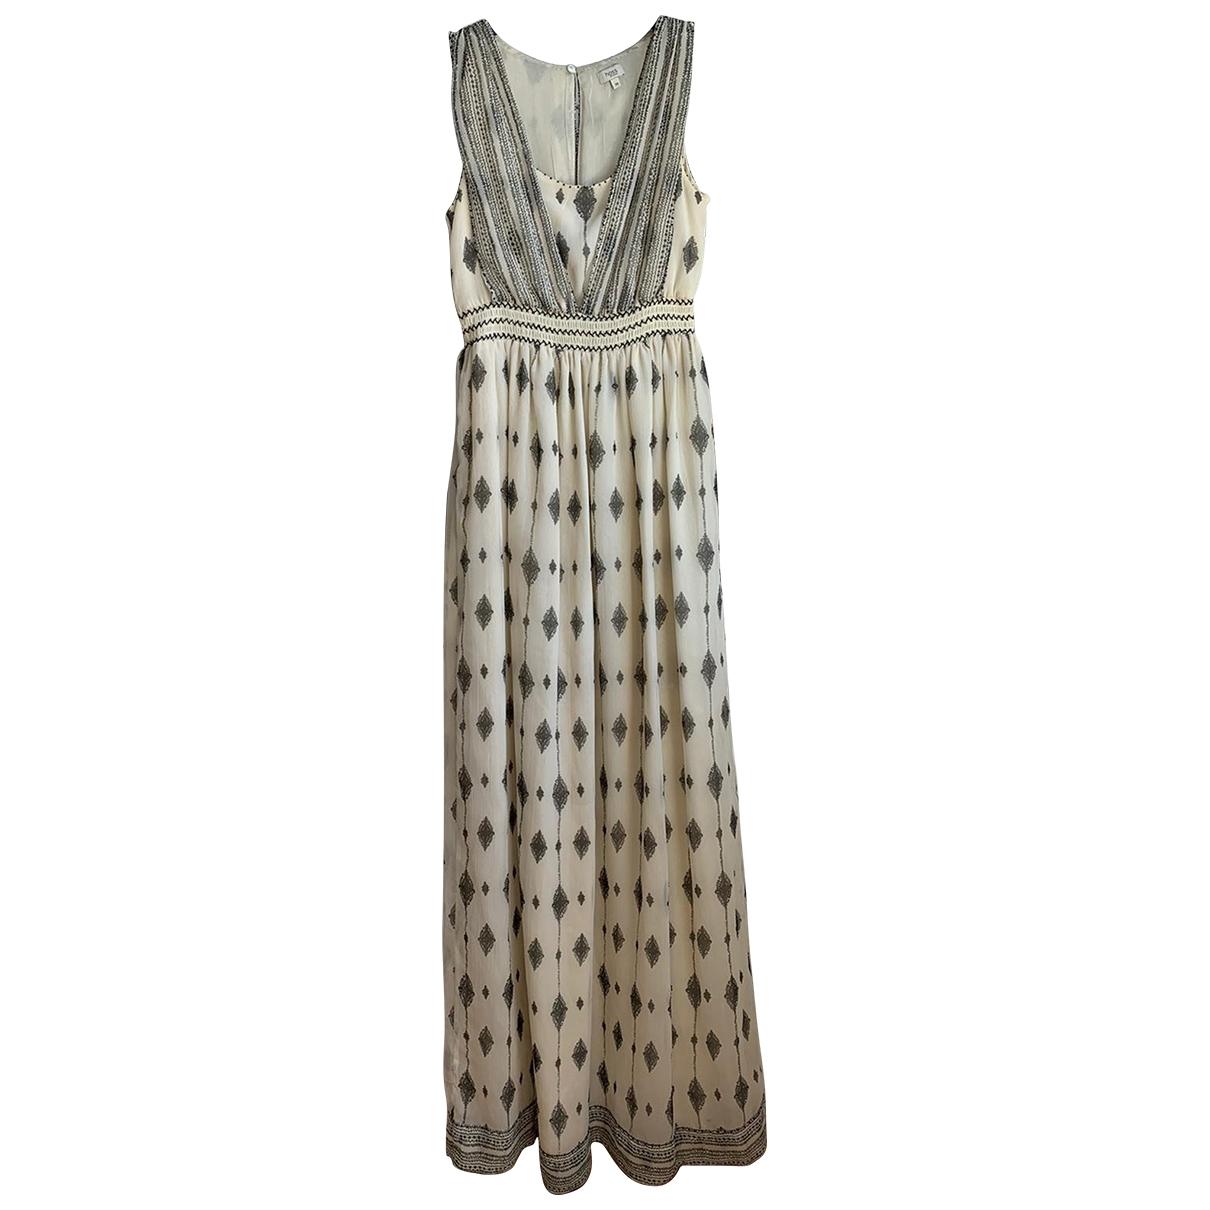 Hoss Intropia \N Ecru dress for Women 34 FR